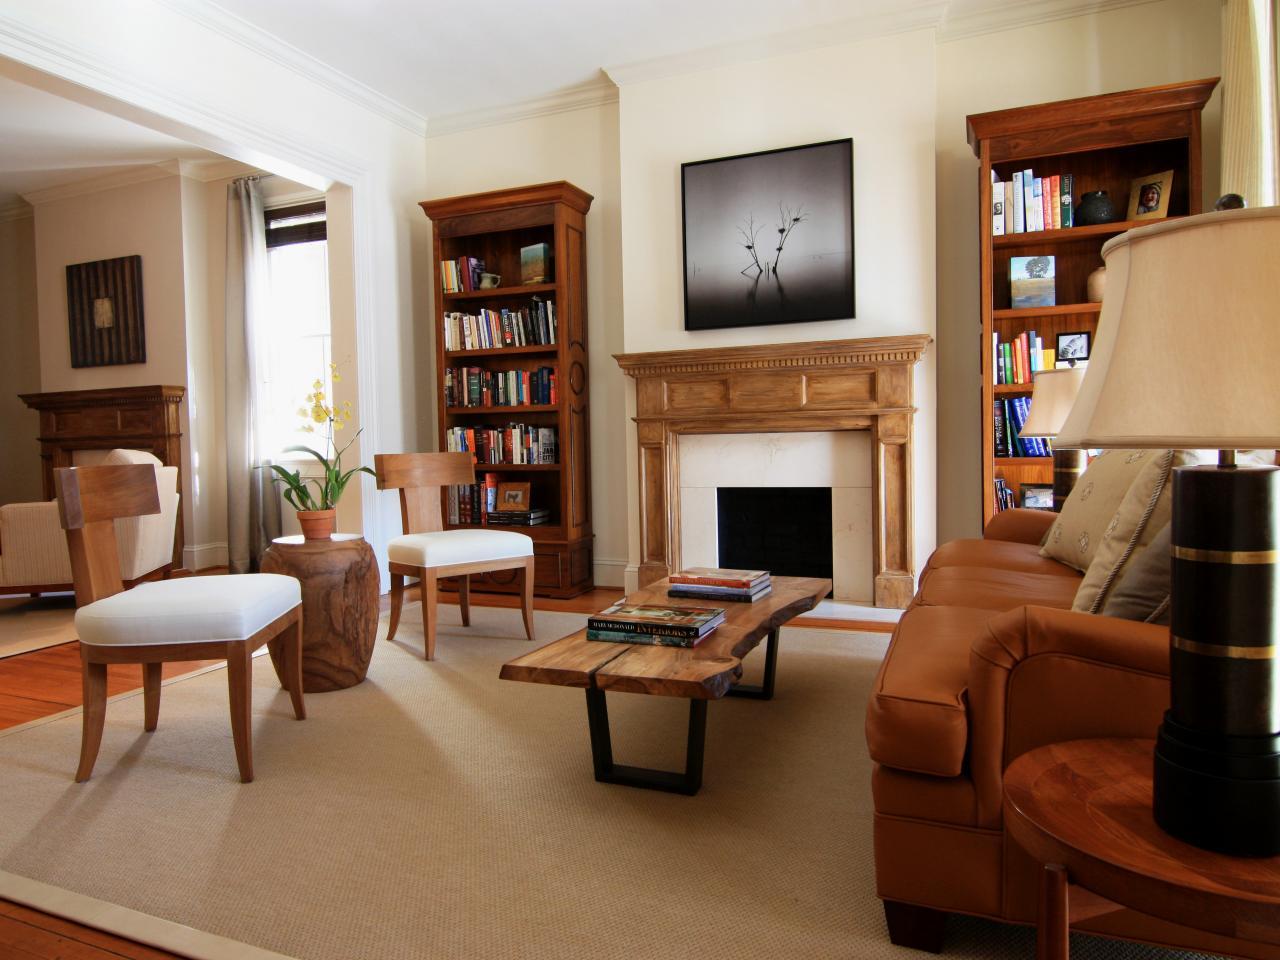 Transitional living room design ideas - Elegant Transitional Living Room